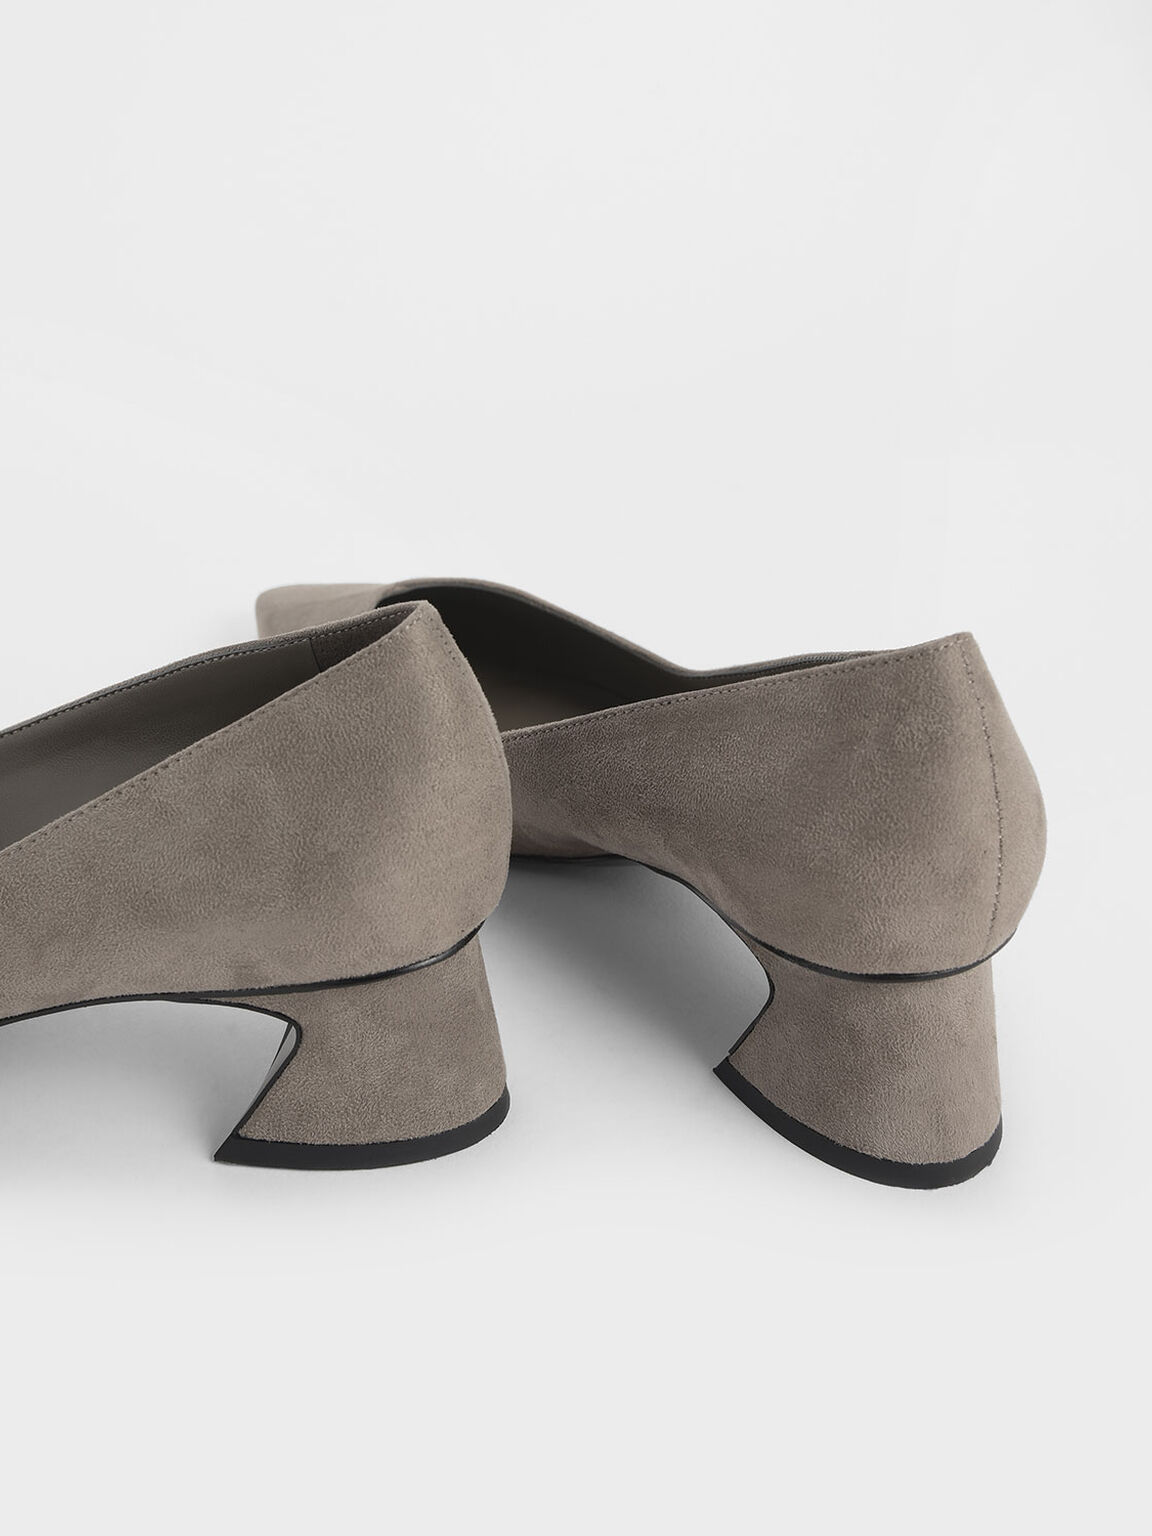 Curved Block Heel Textured Pumps, Taupe, hi-res